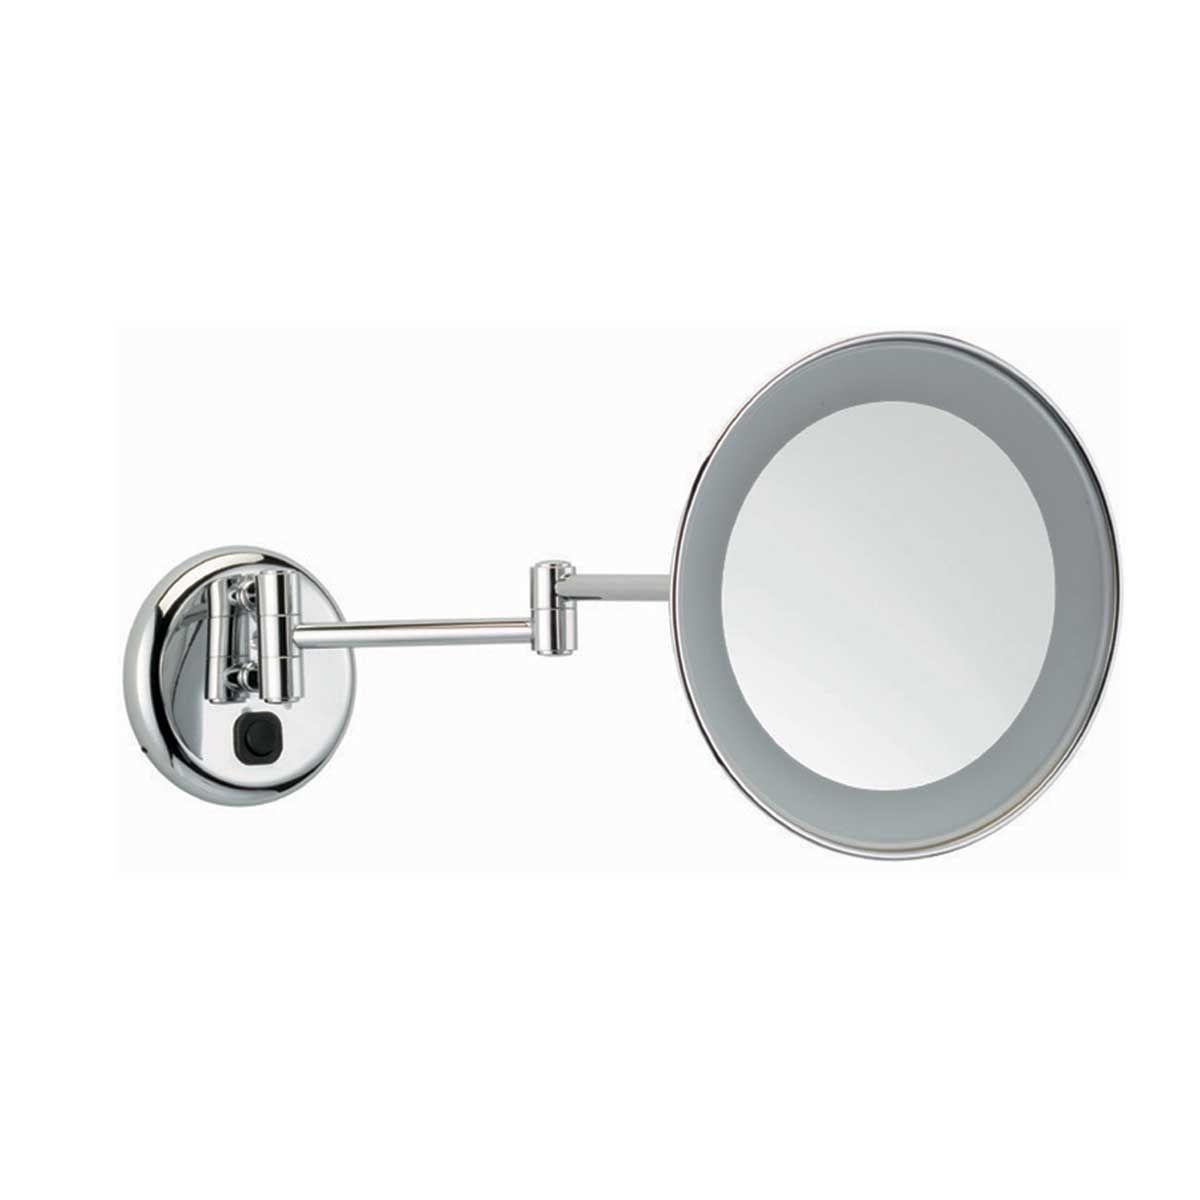 Specchio ingranditore con luce 22 cm braccio doppio 2x sp 811 bagno associati - Specchio ingranditore con luce ...